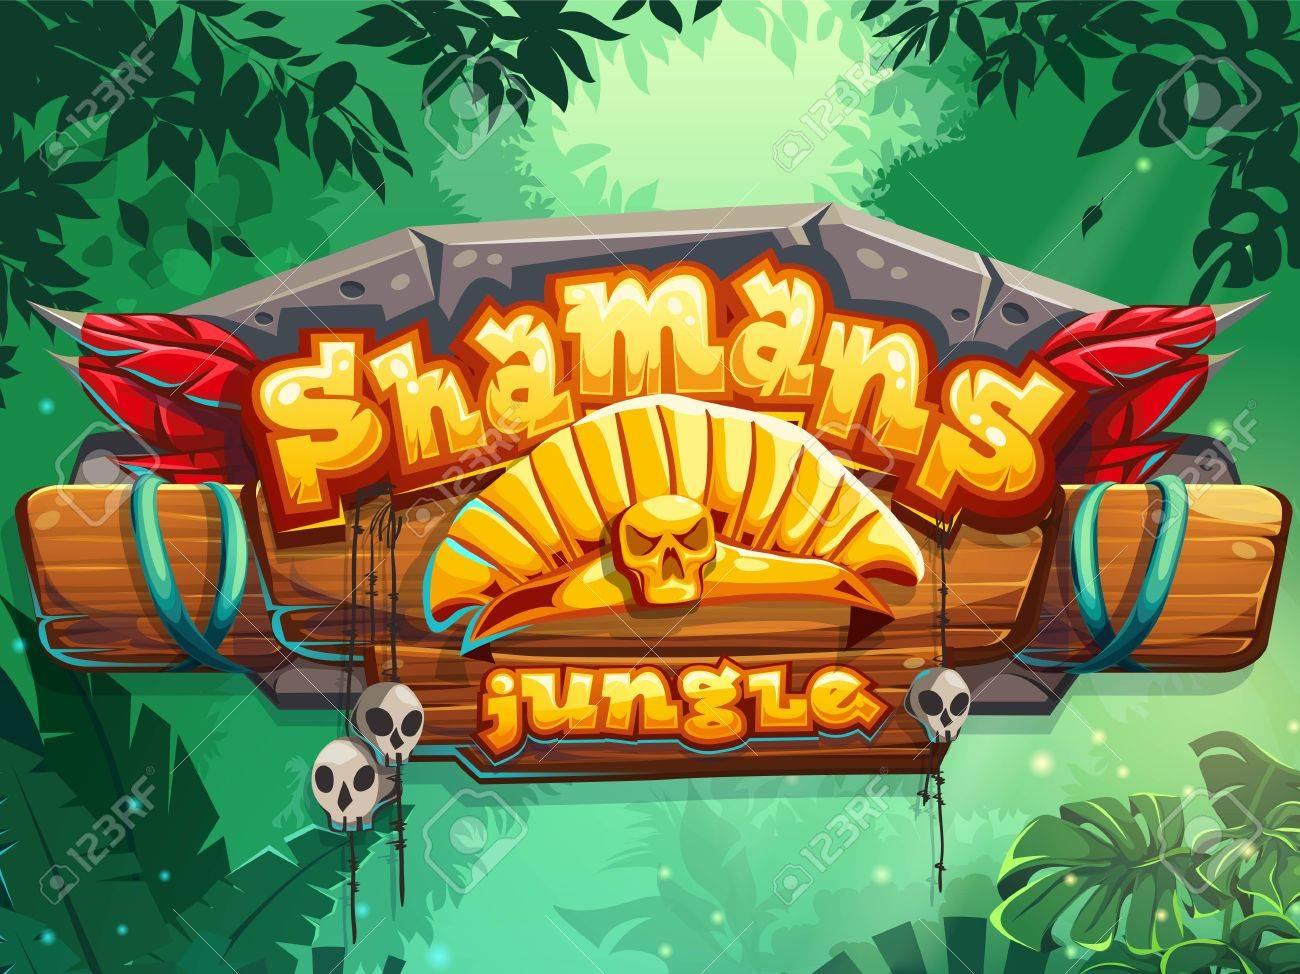 Jungle shamans start page cute illustration - 63580968